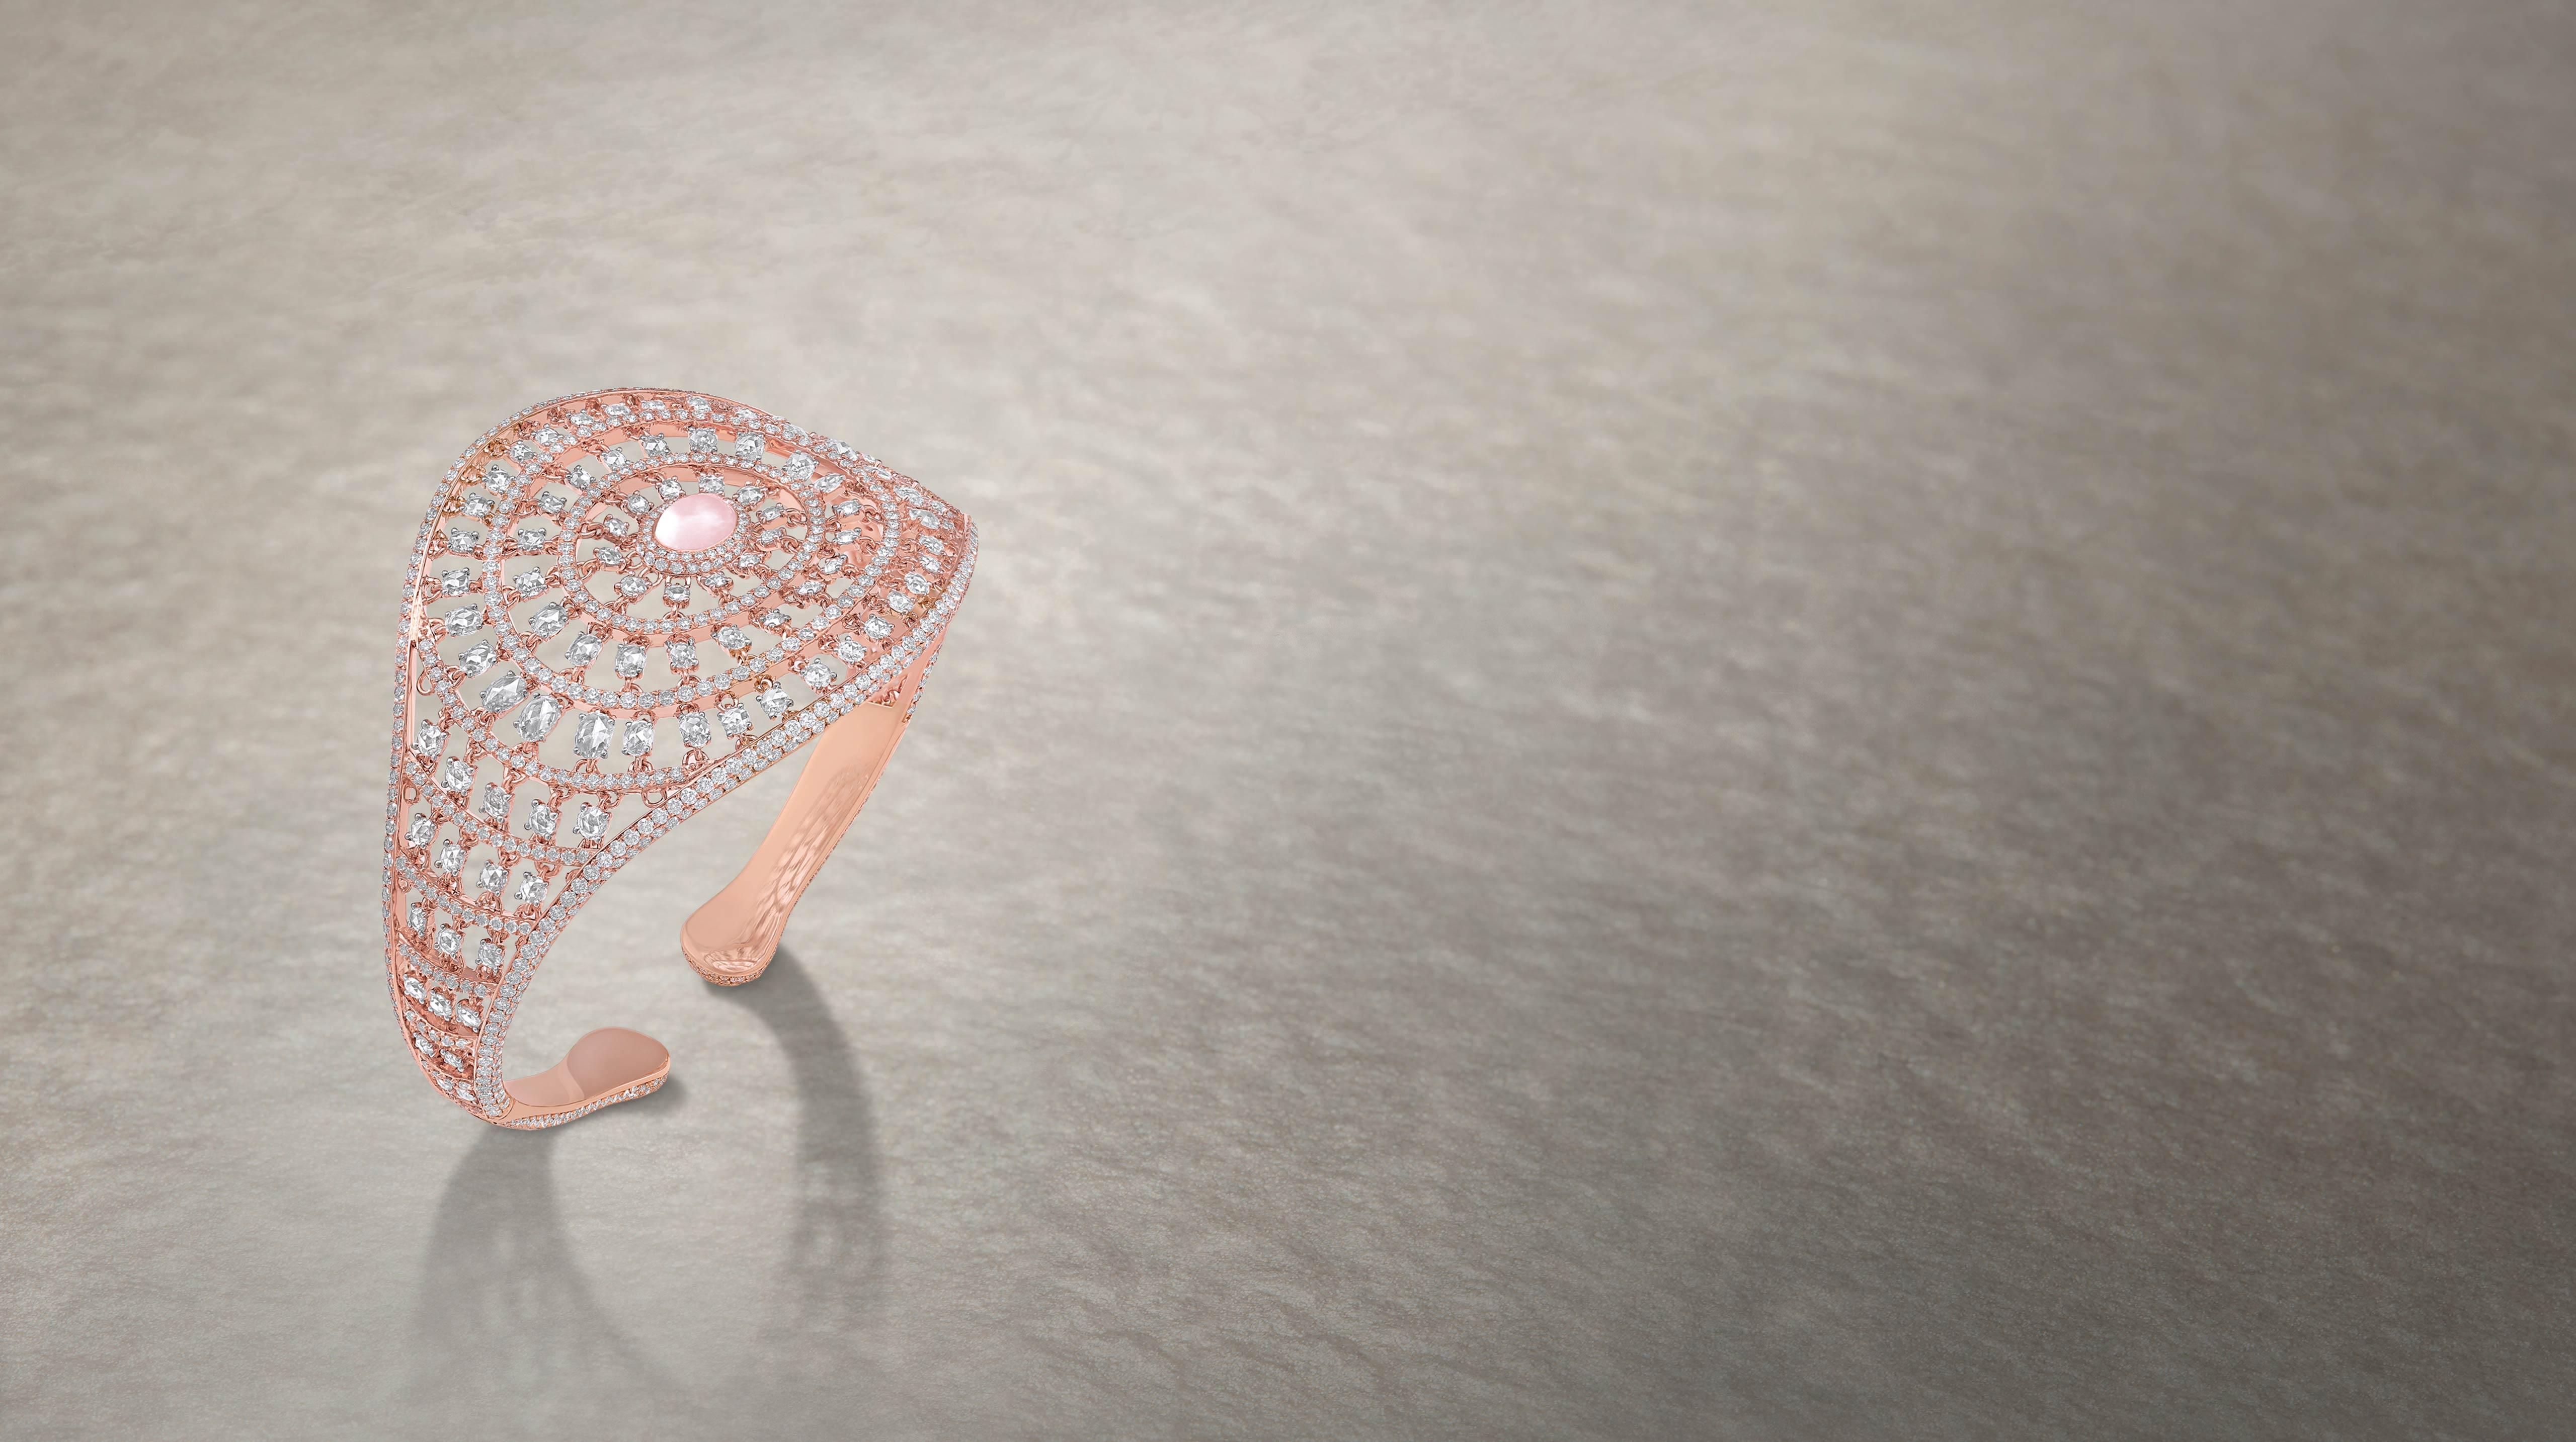 Jewel - elegant, like the evergreen weaves of Lucknowi Chikankari embroidery.